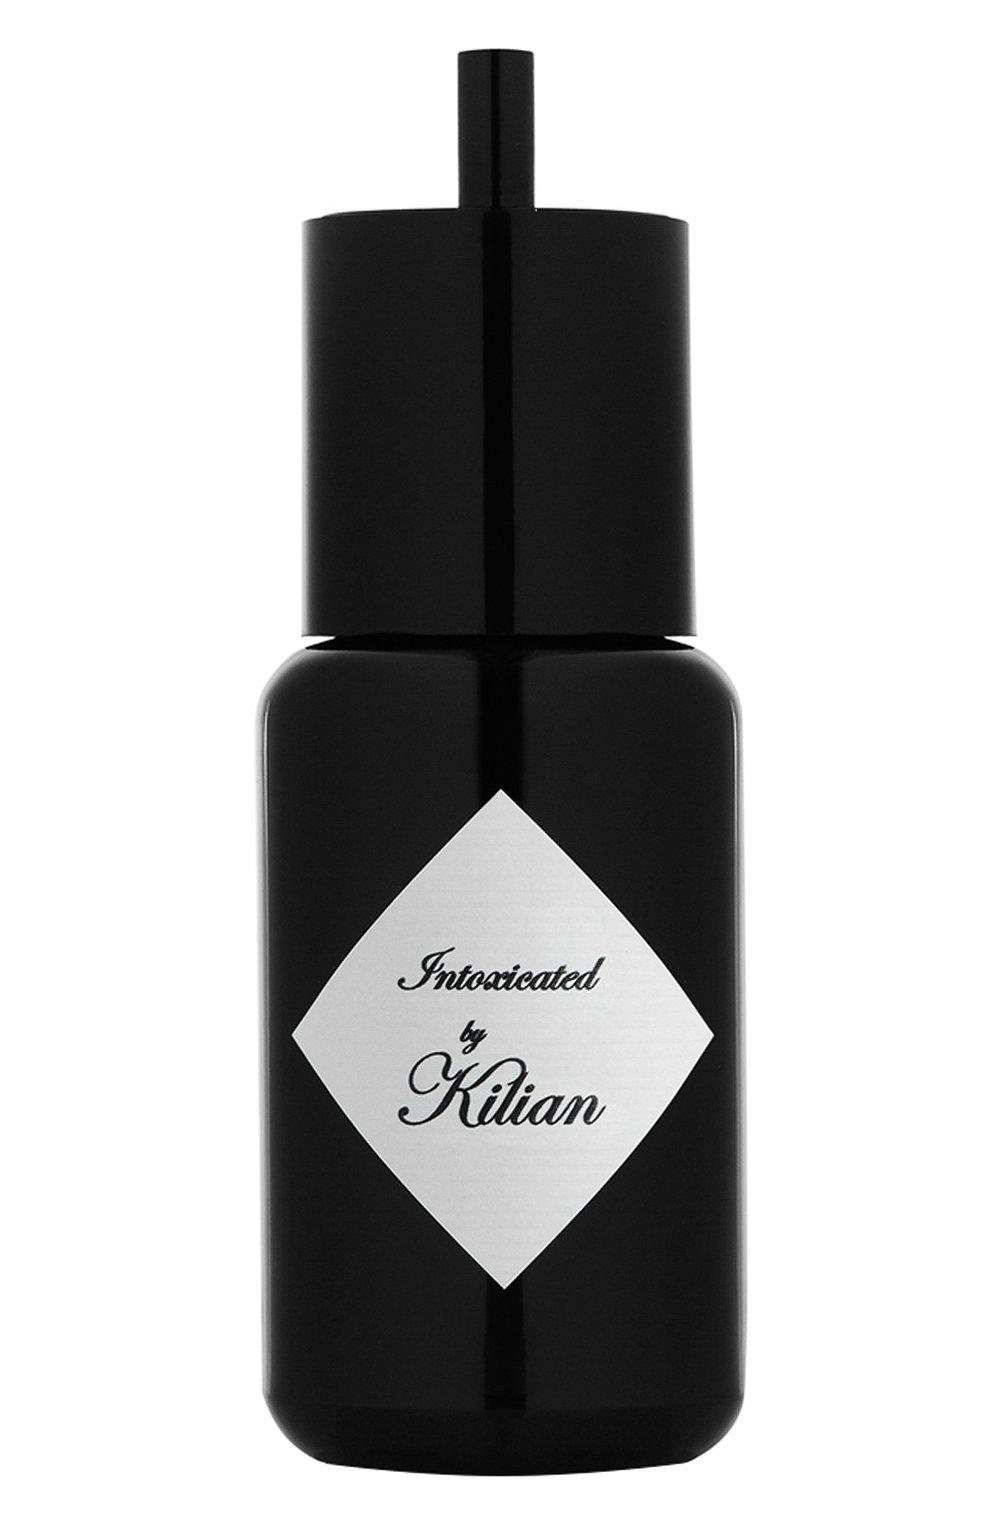 Мужской парфюмерная вода intoxicated refill (50ml) KILIAN бесцветного цвета, арт. 3760184353725 | Фото 1 (Ограничения доставки: flammable)